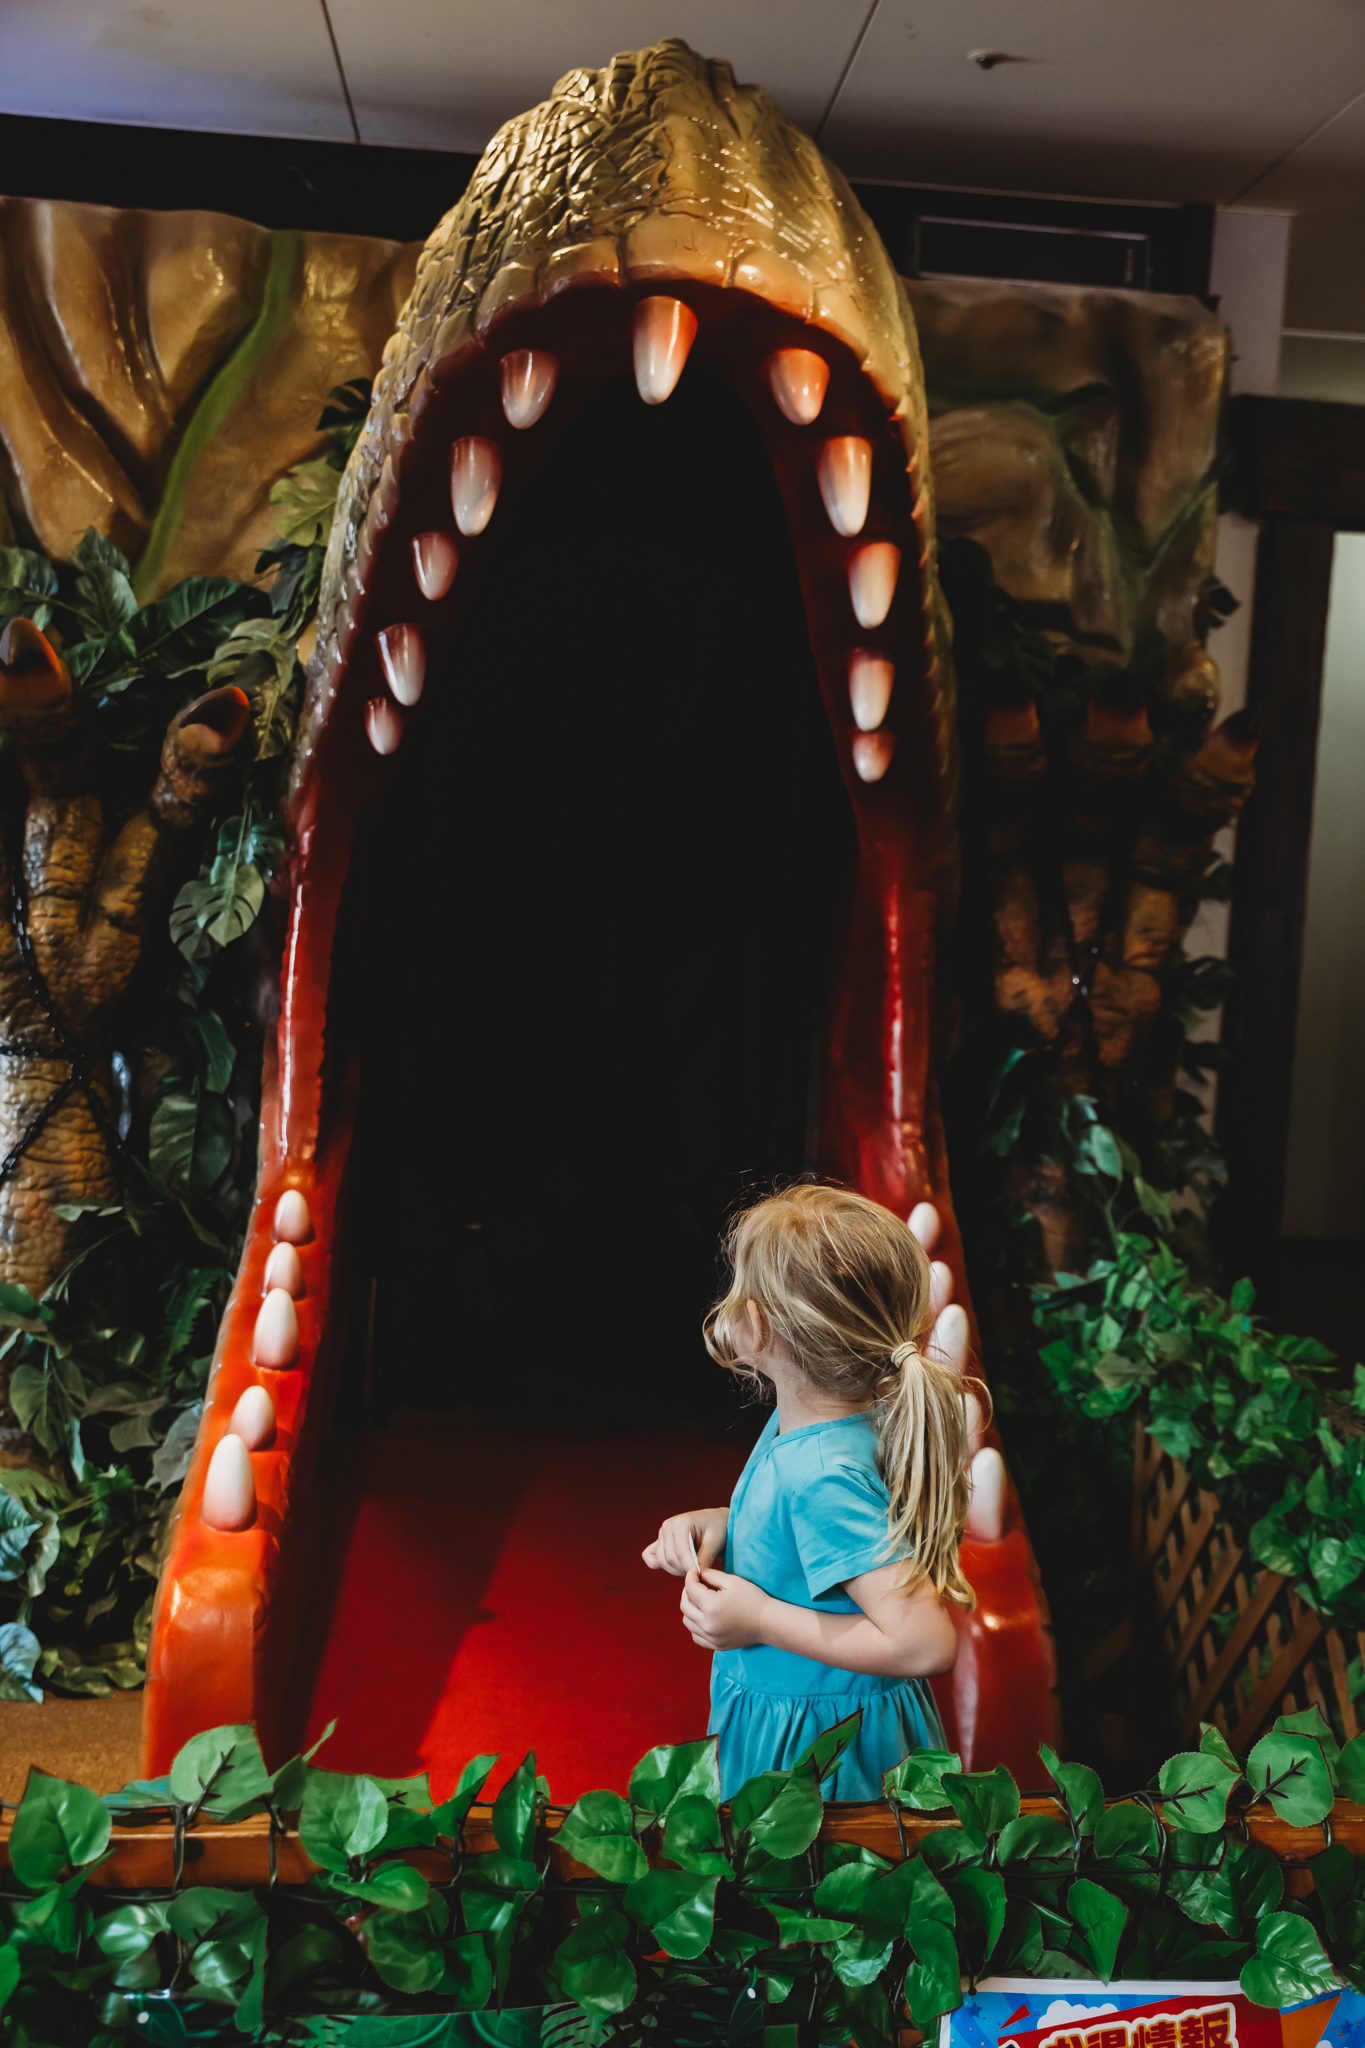 We stumbled on some kind of dinosaur exhibit